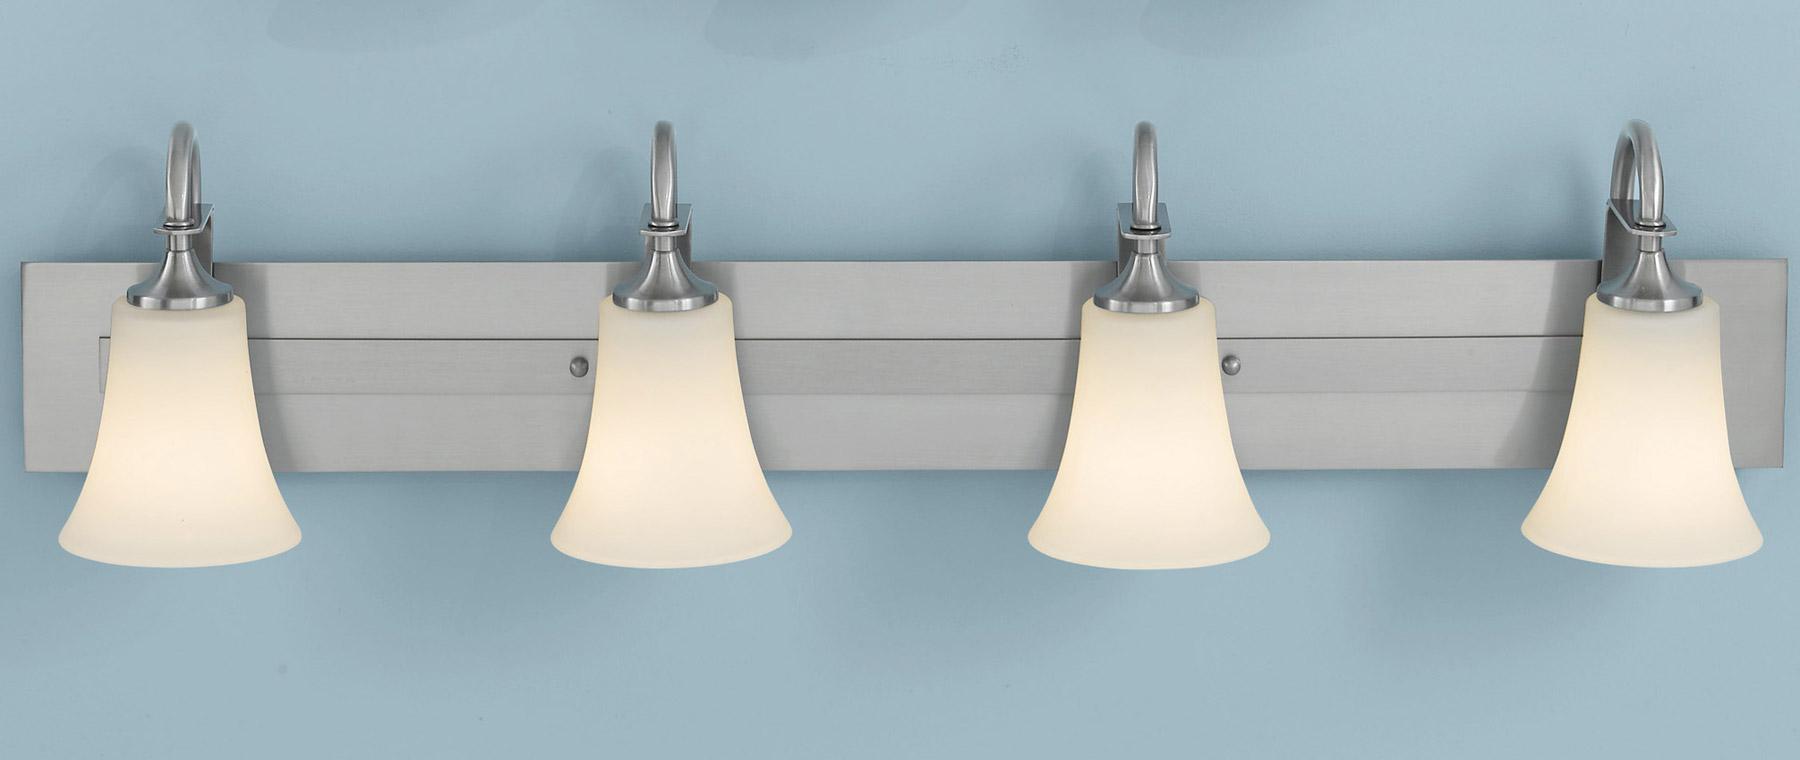 wall lighting bathroom vanity lights murray feiss vs12704 bs. Black Bedroom Furniture Sets. Home Design Ideas